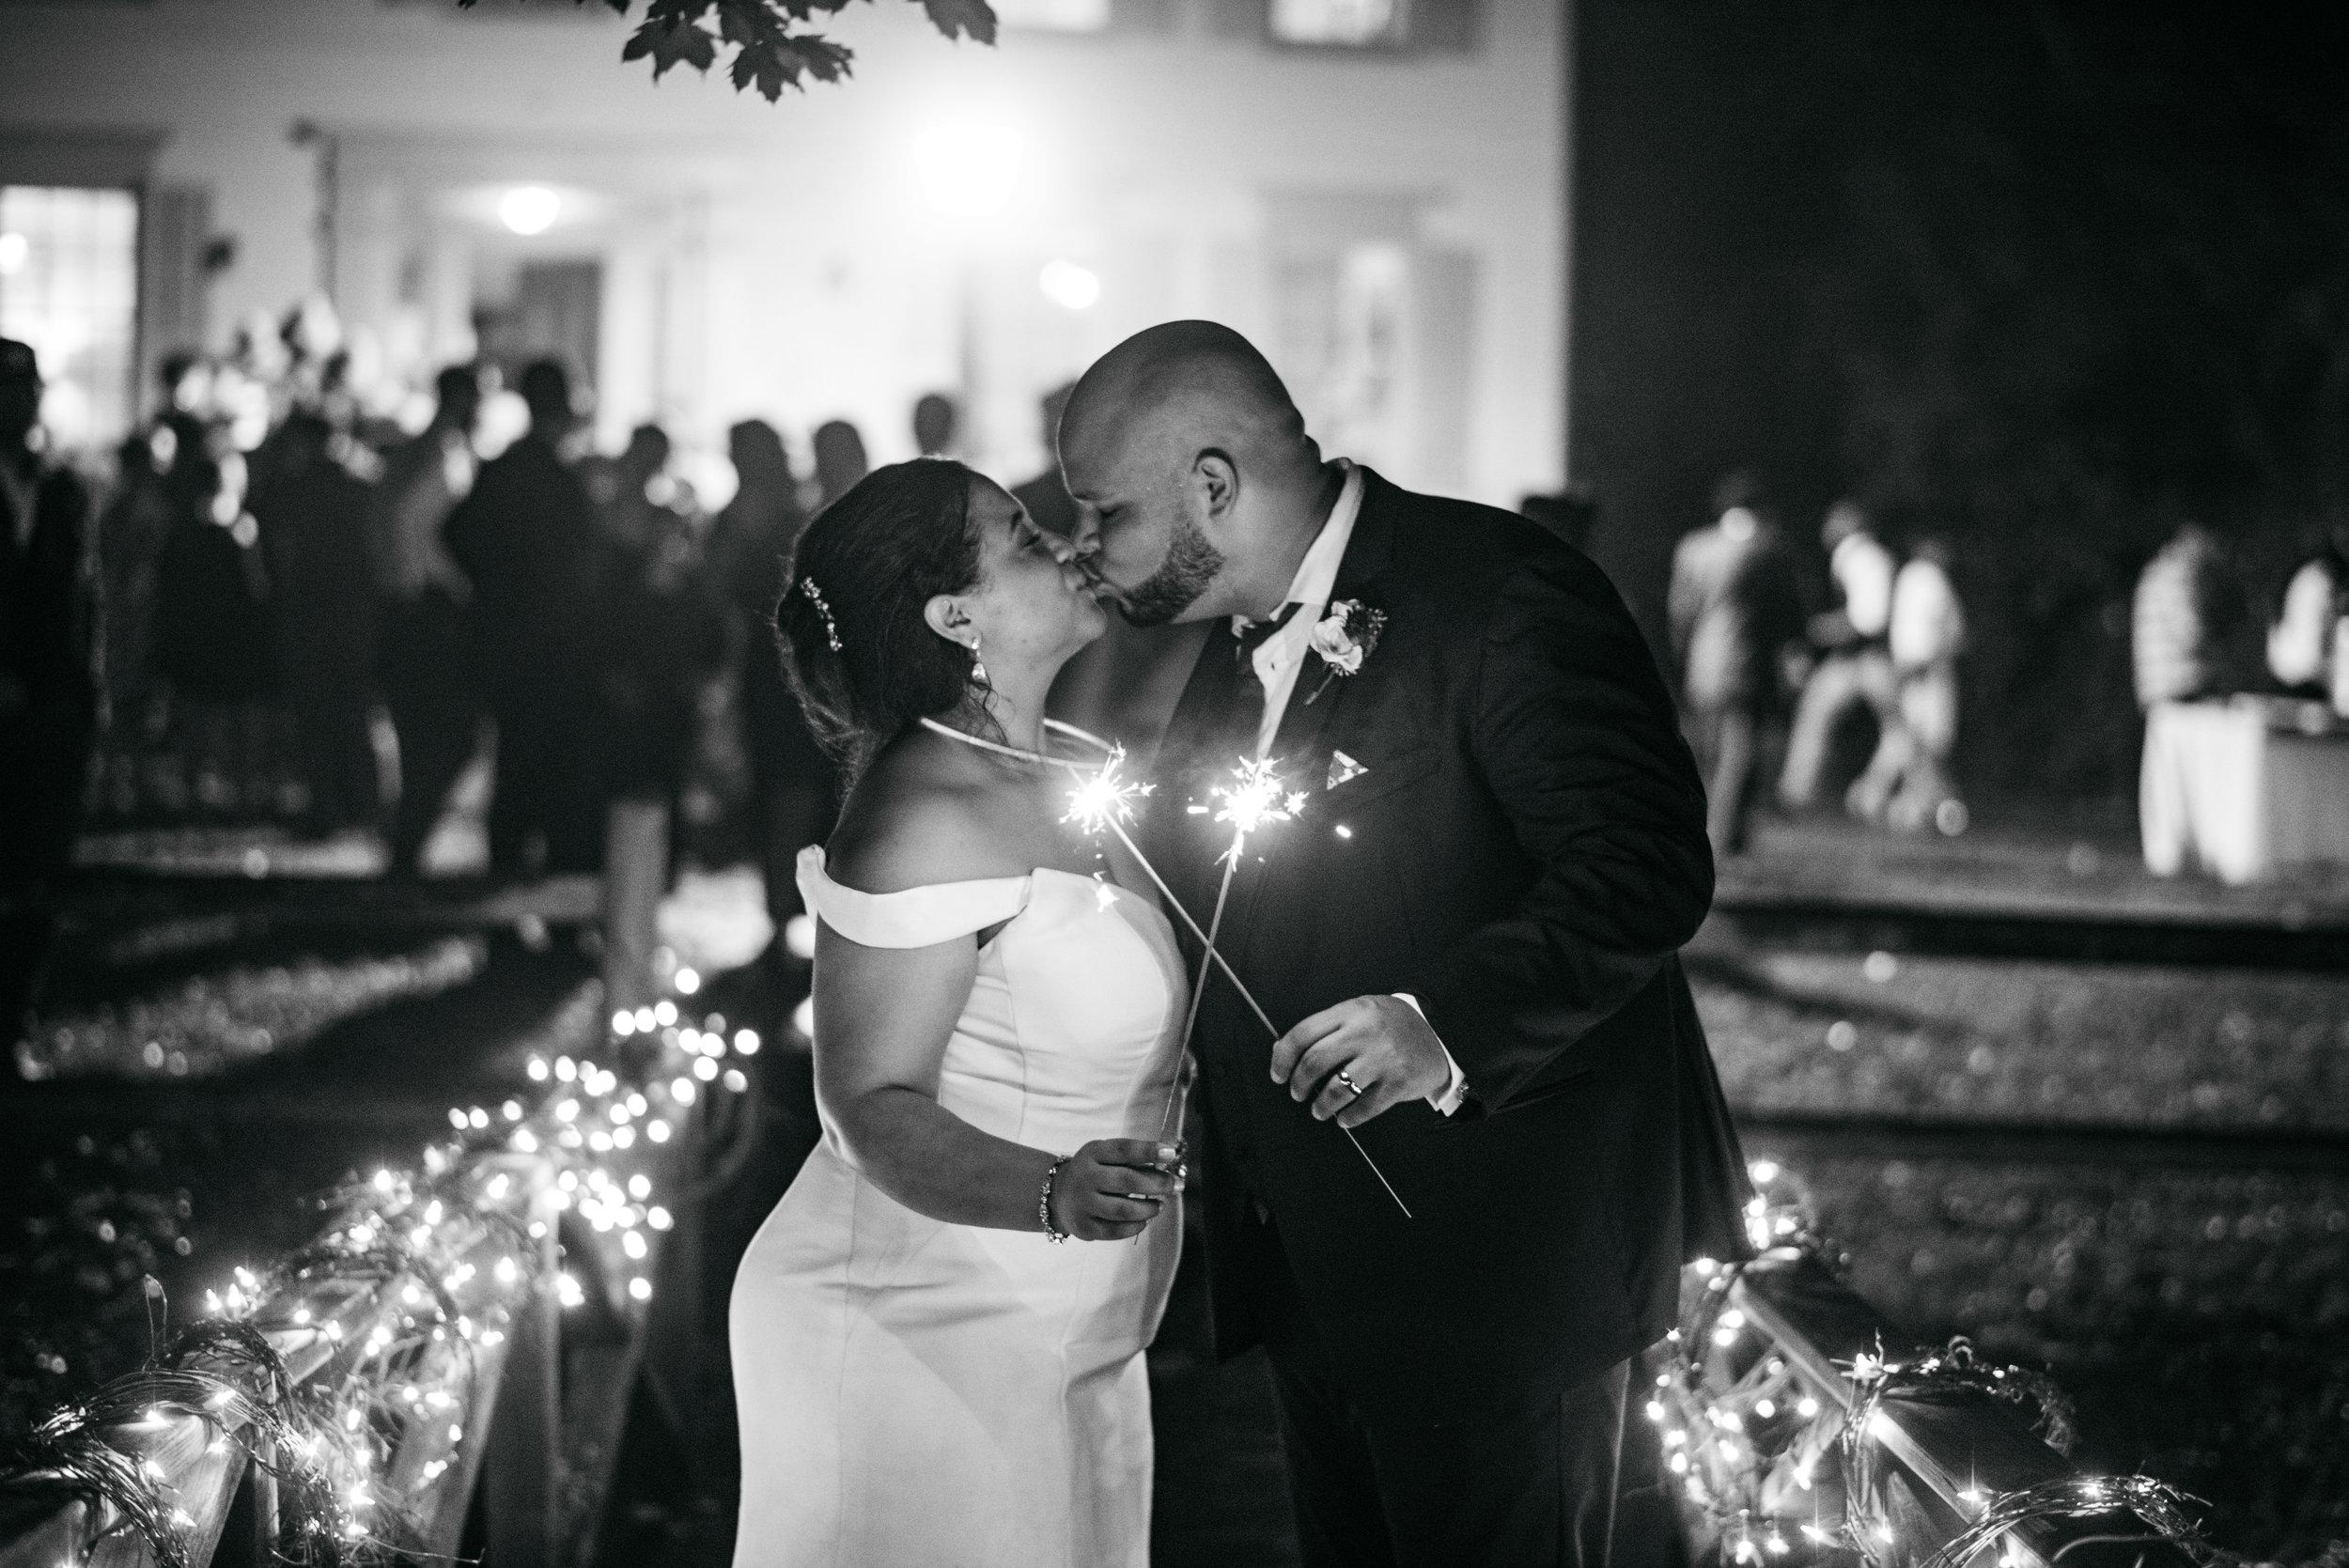 WeddingPhotos | NJPhotographer | Highlights-12-13.jpg